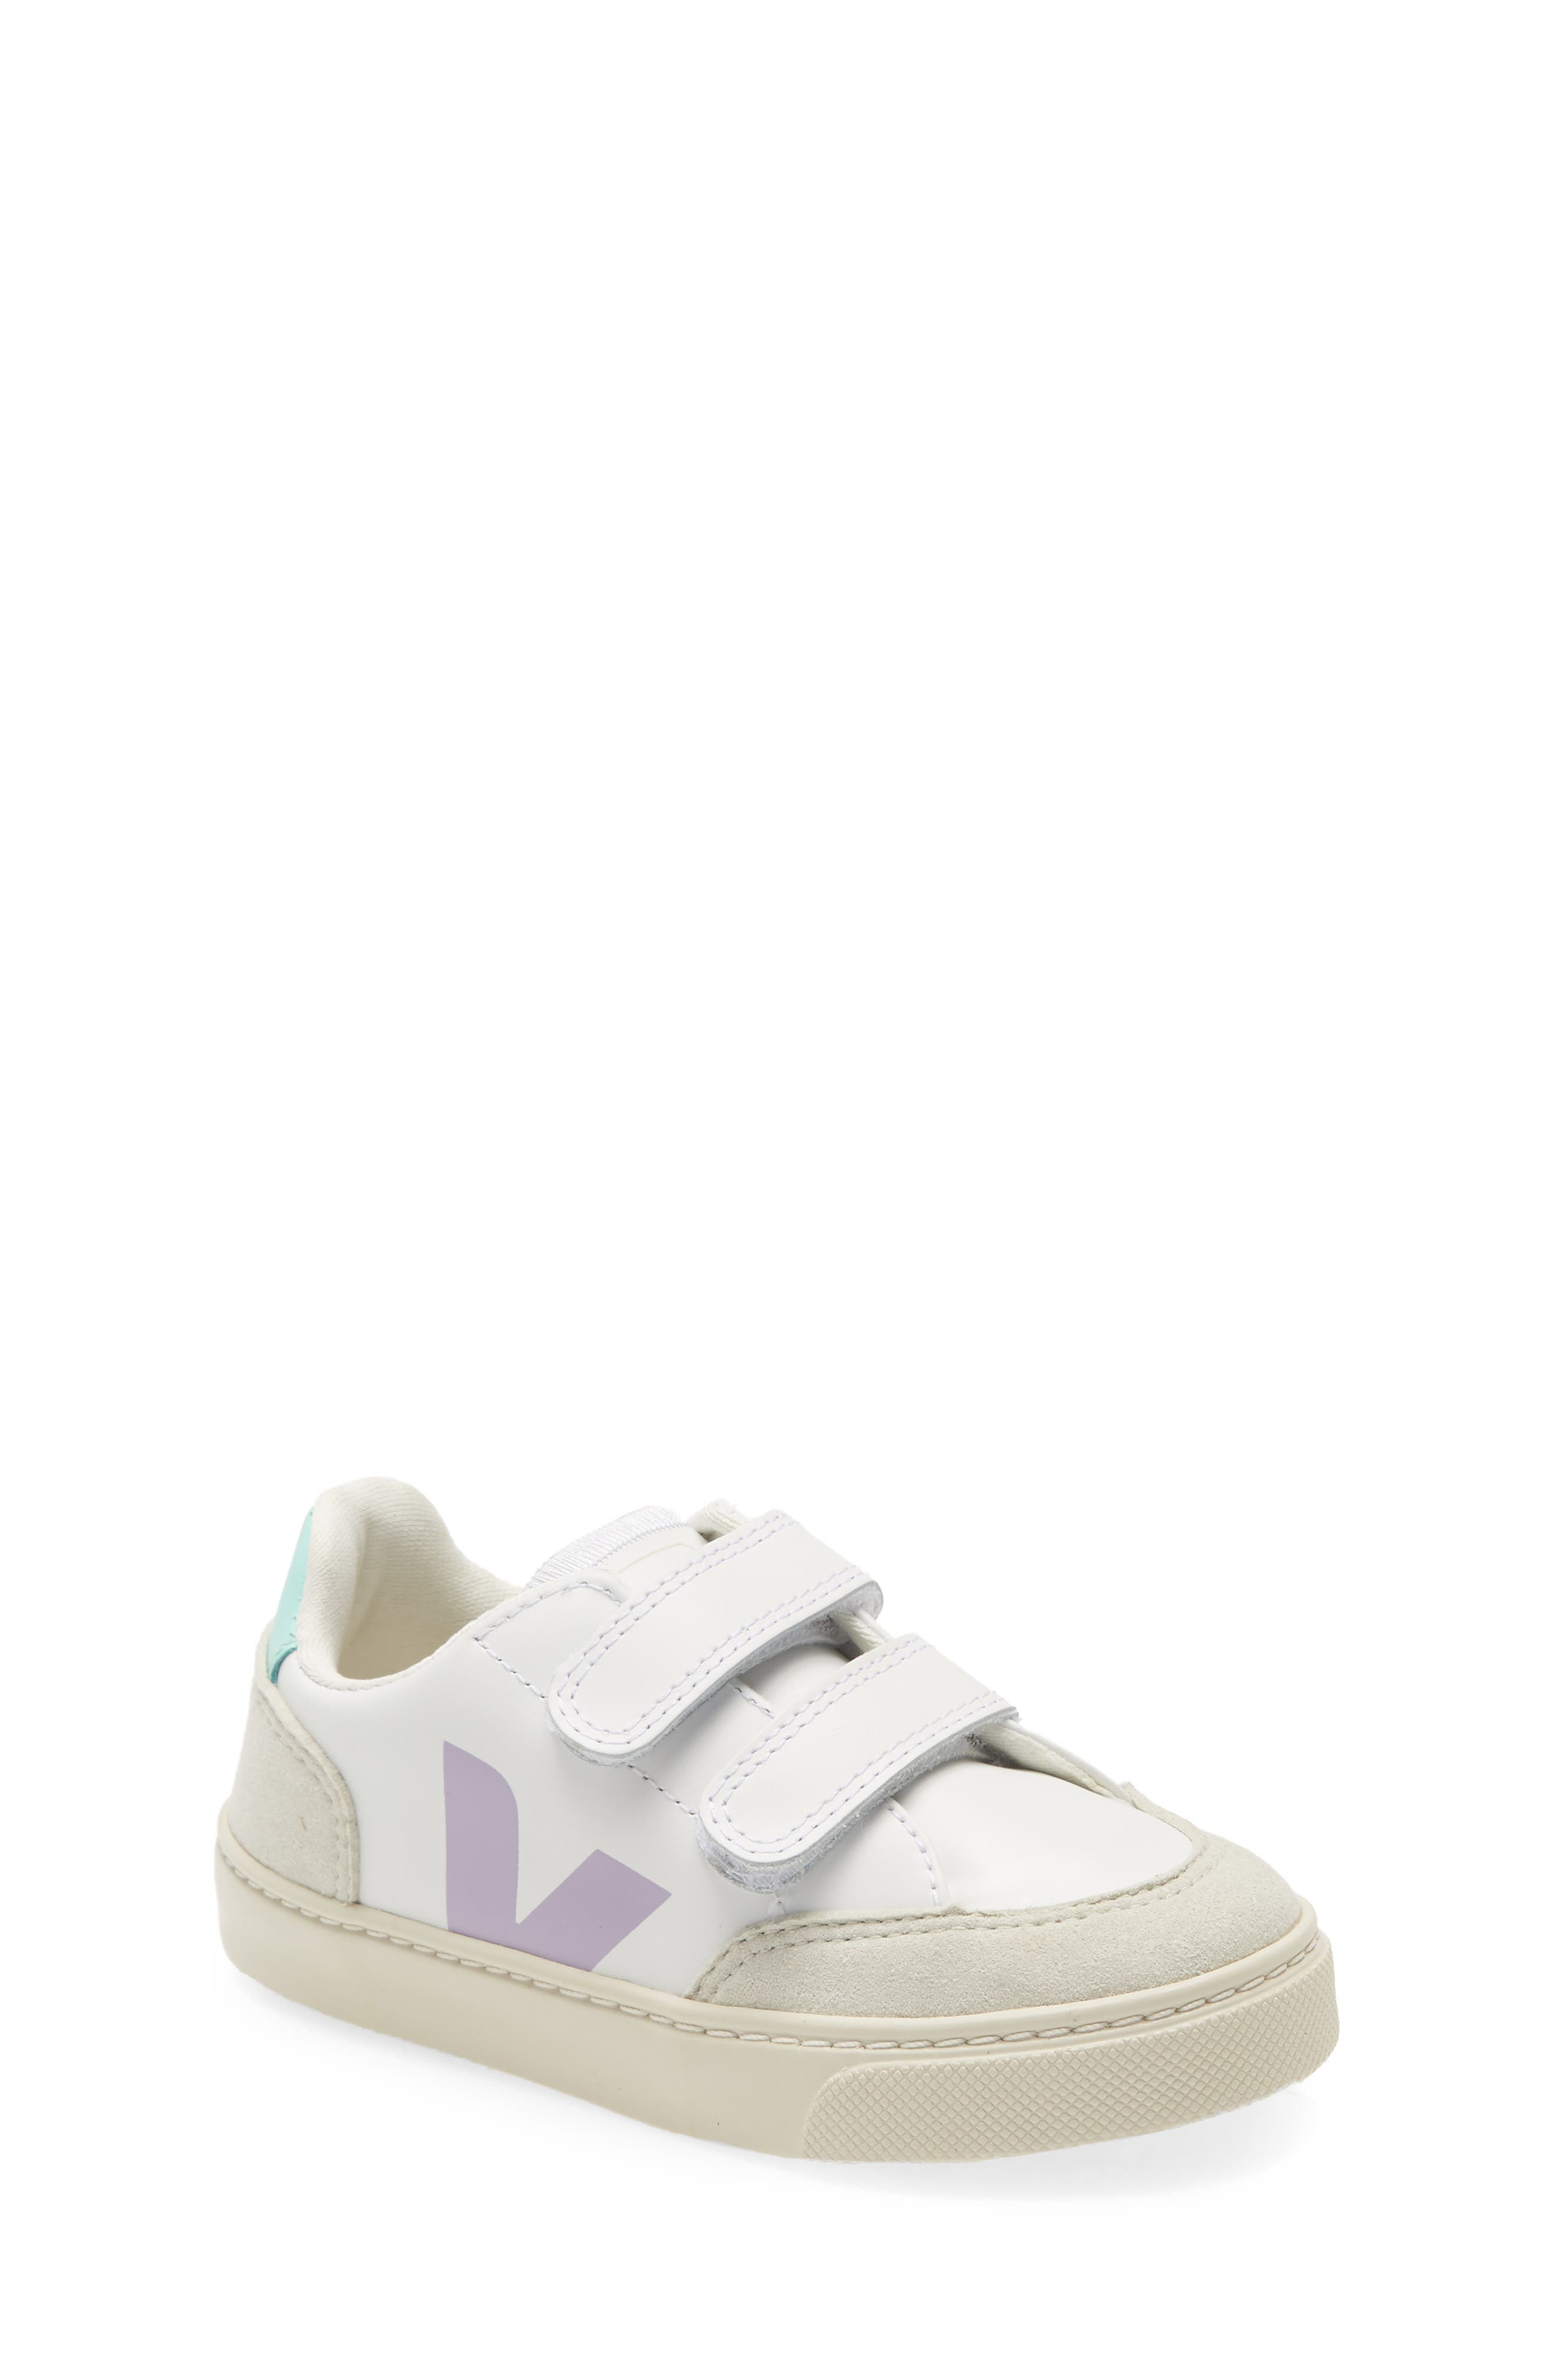 Boys' Veja Shoes